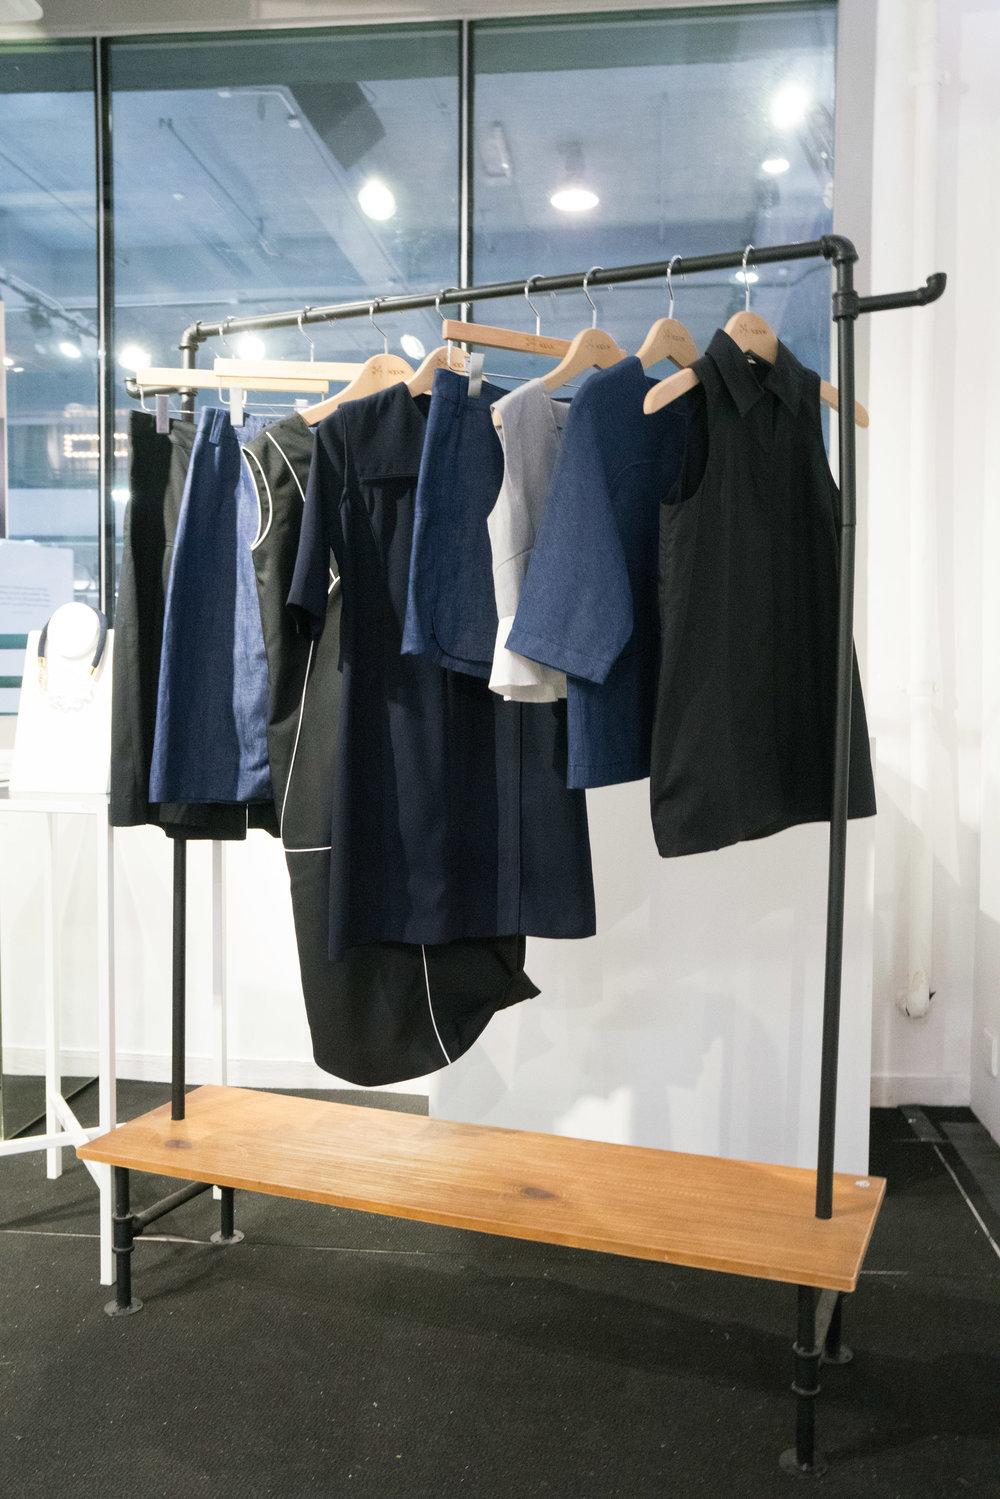 kapok x The EcoChic Design Award Alumni prize sustainable showcase launch event_Aug 11_Wan and Wong6.jpg